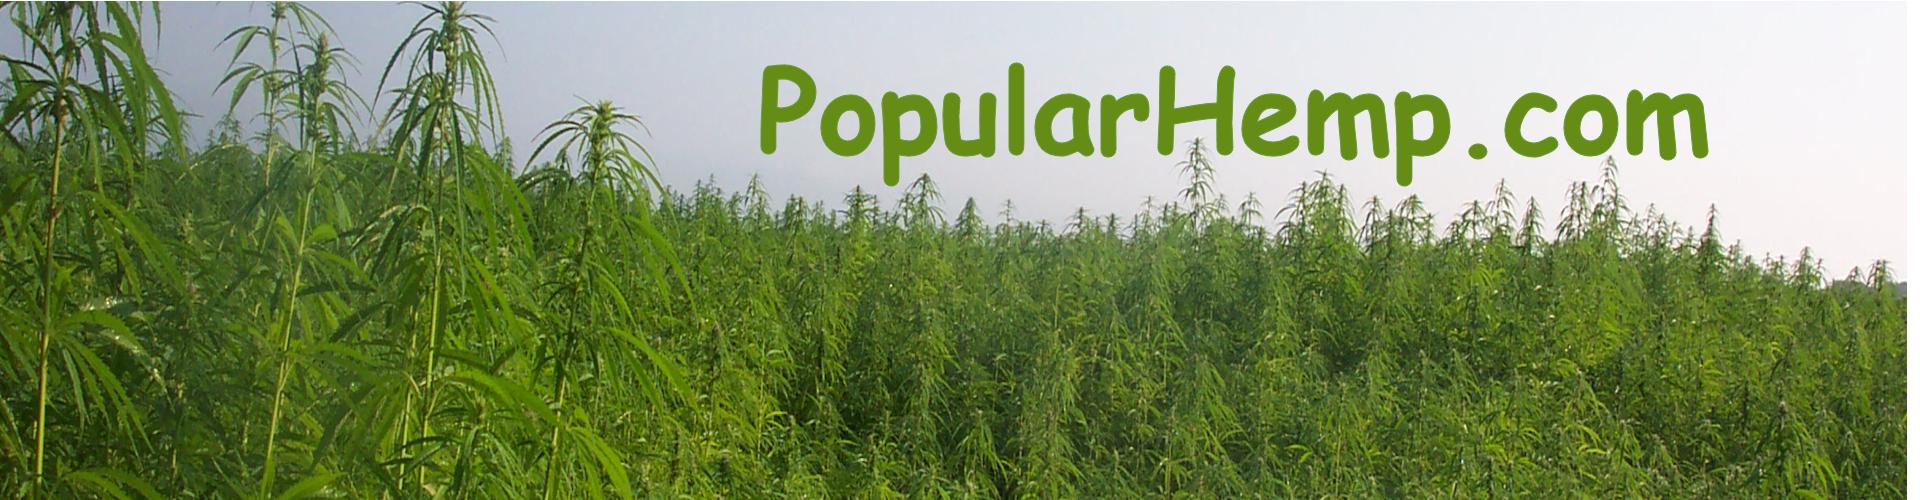 Popular Hemp